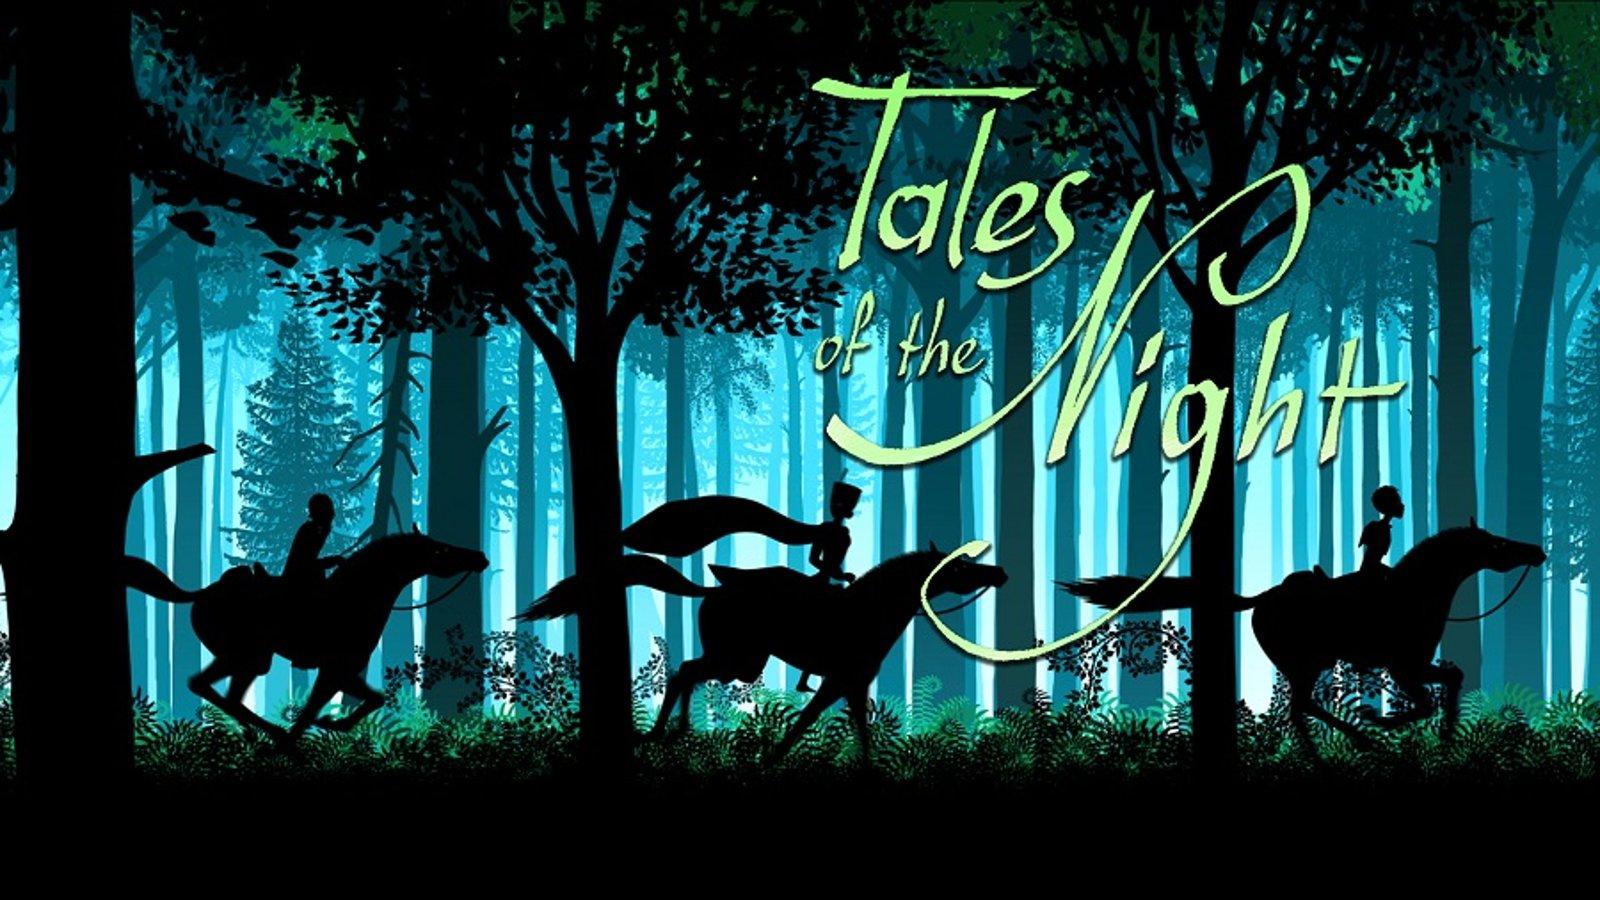 Tales of The Night - Les contes de la nuit